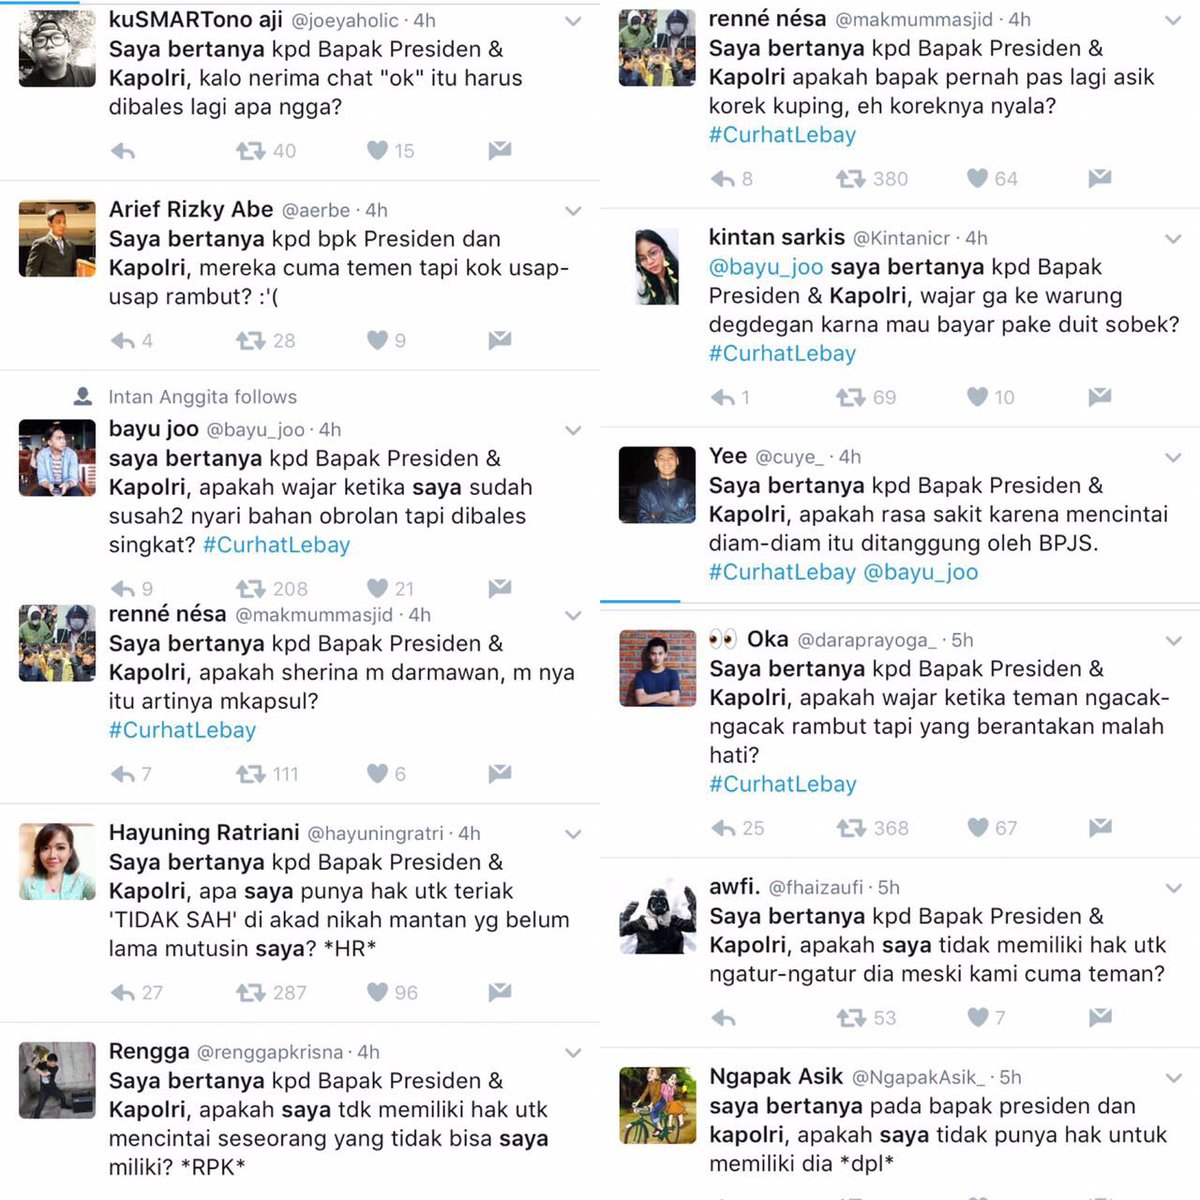 Edward Suhadi On Twitter The Best Of Semua Bakat Jadi Korek Kuping Nyala Copywriter Https Tco Guskmdudsc